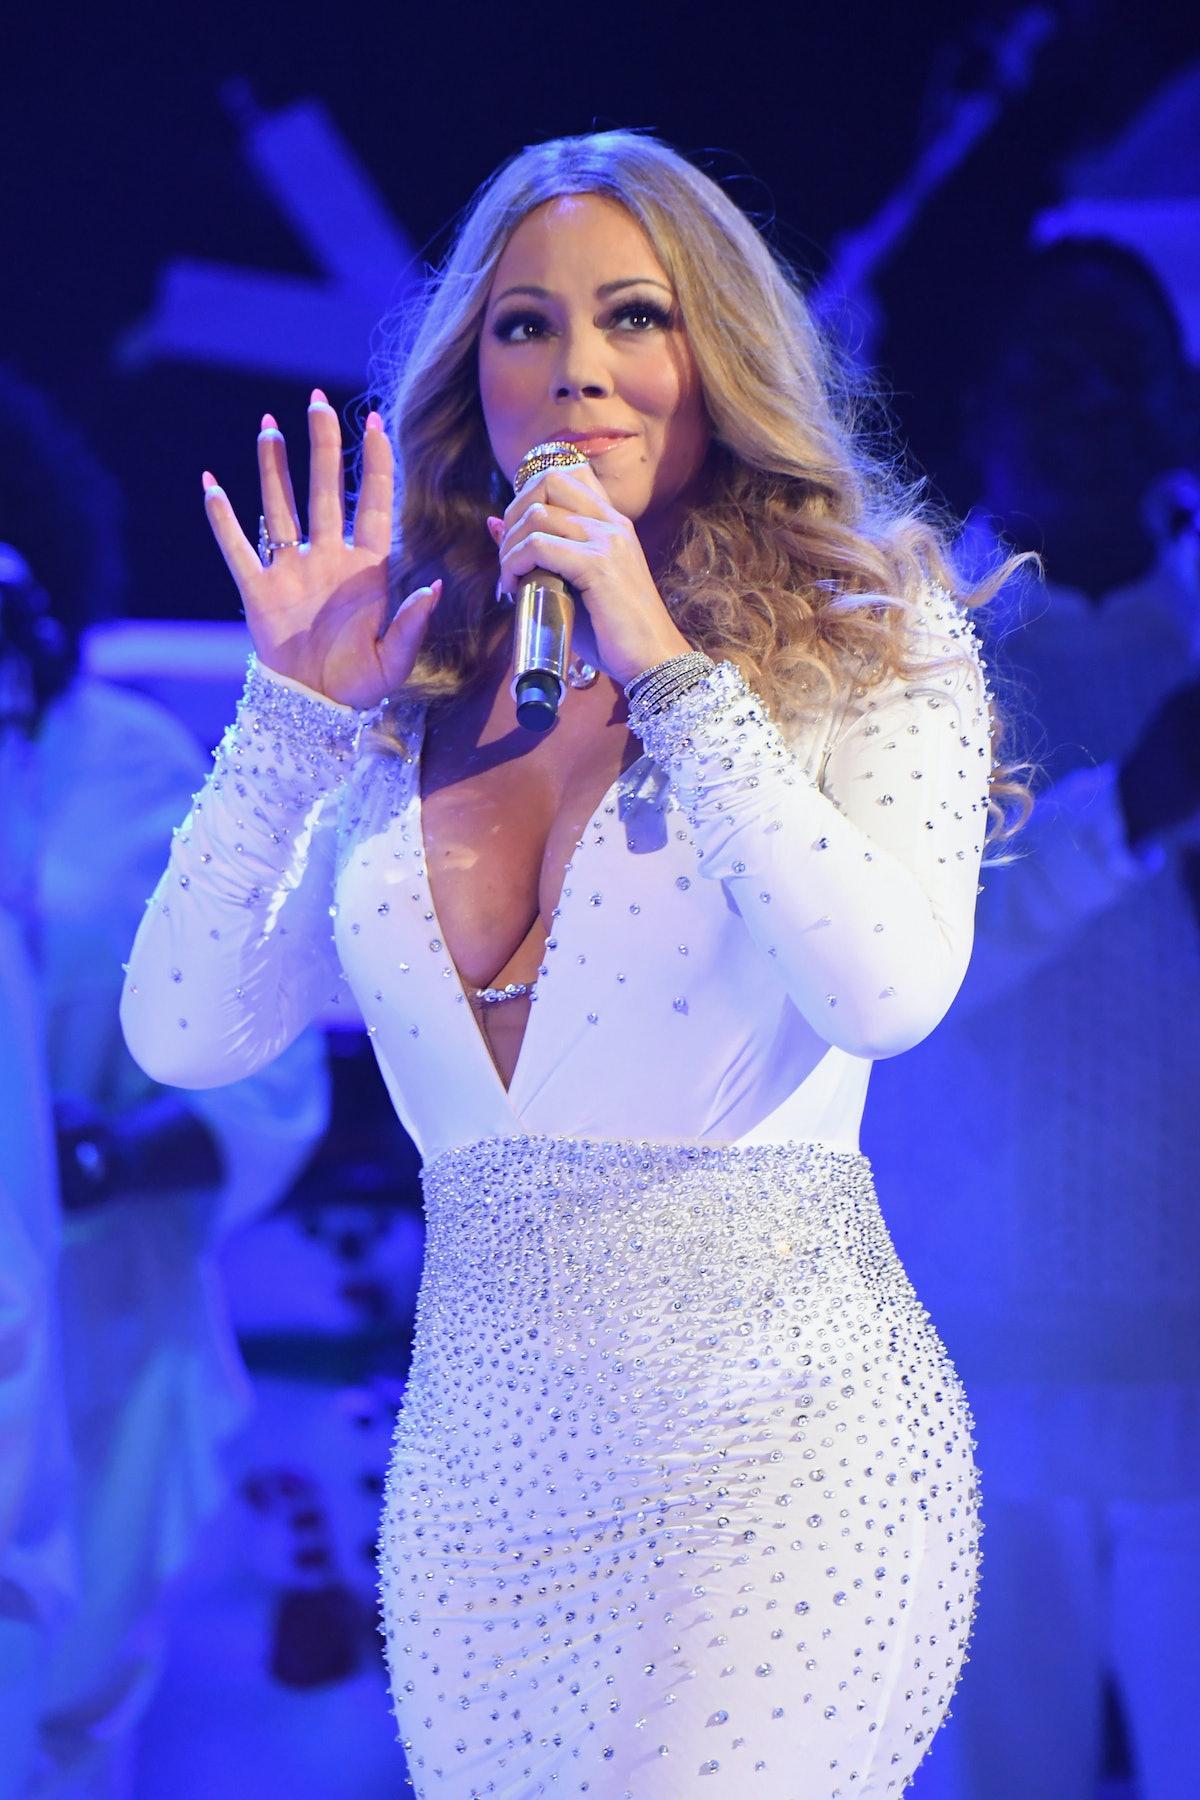 Mariah Carey performs live in concert.